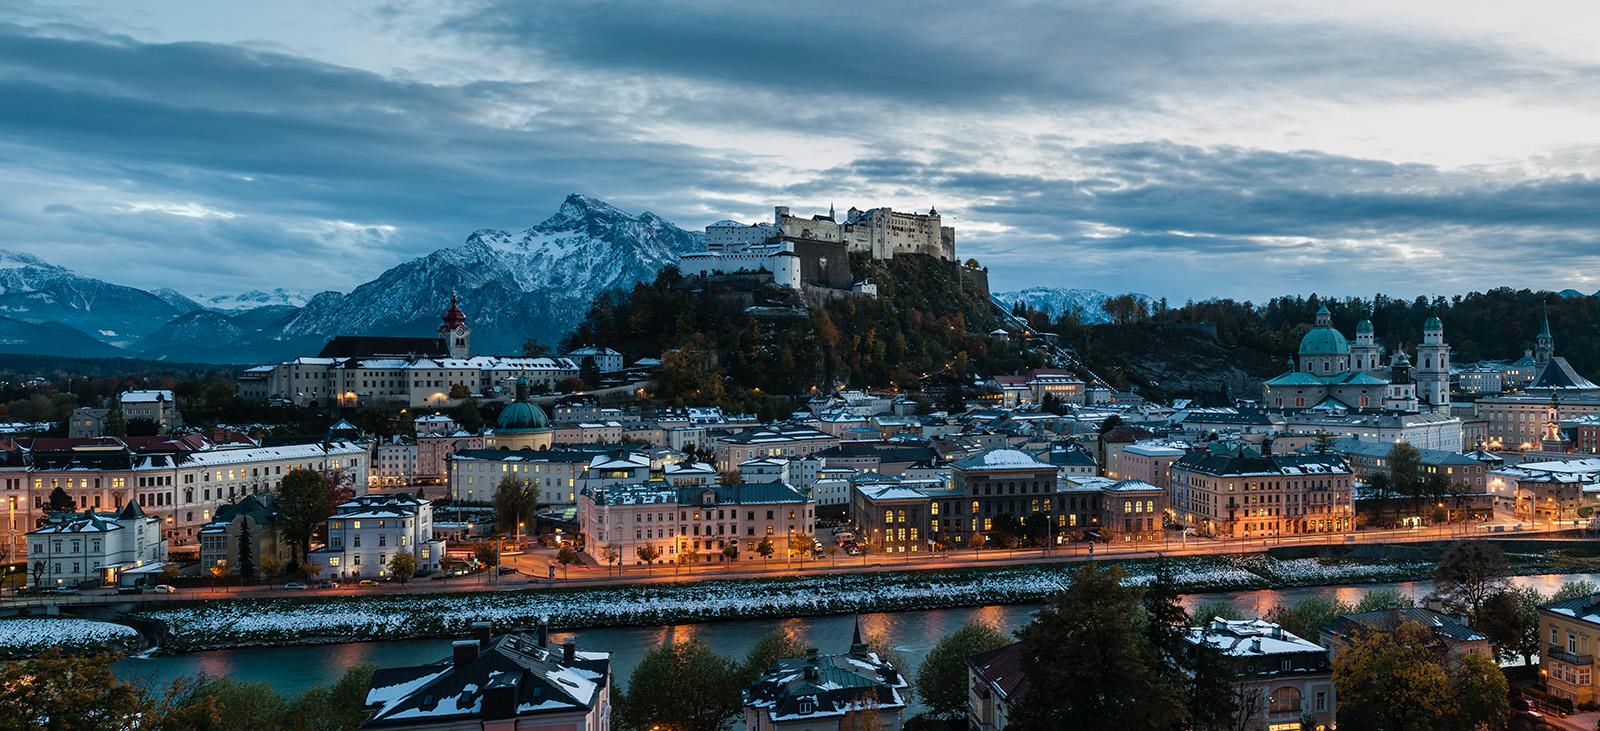 Salzburgpanorama4 2